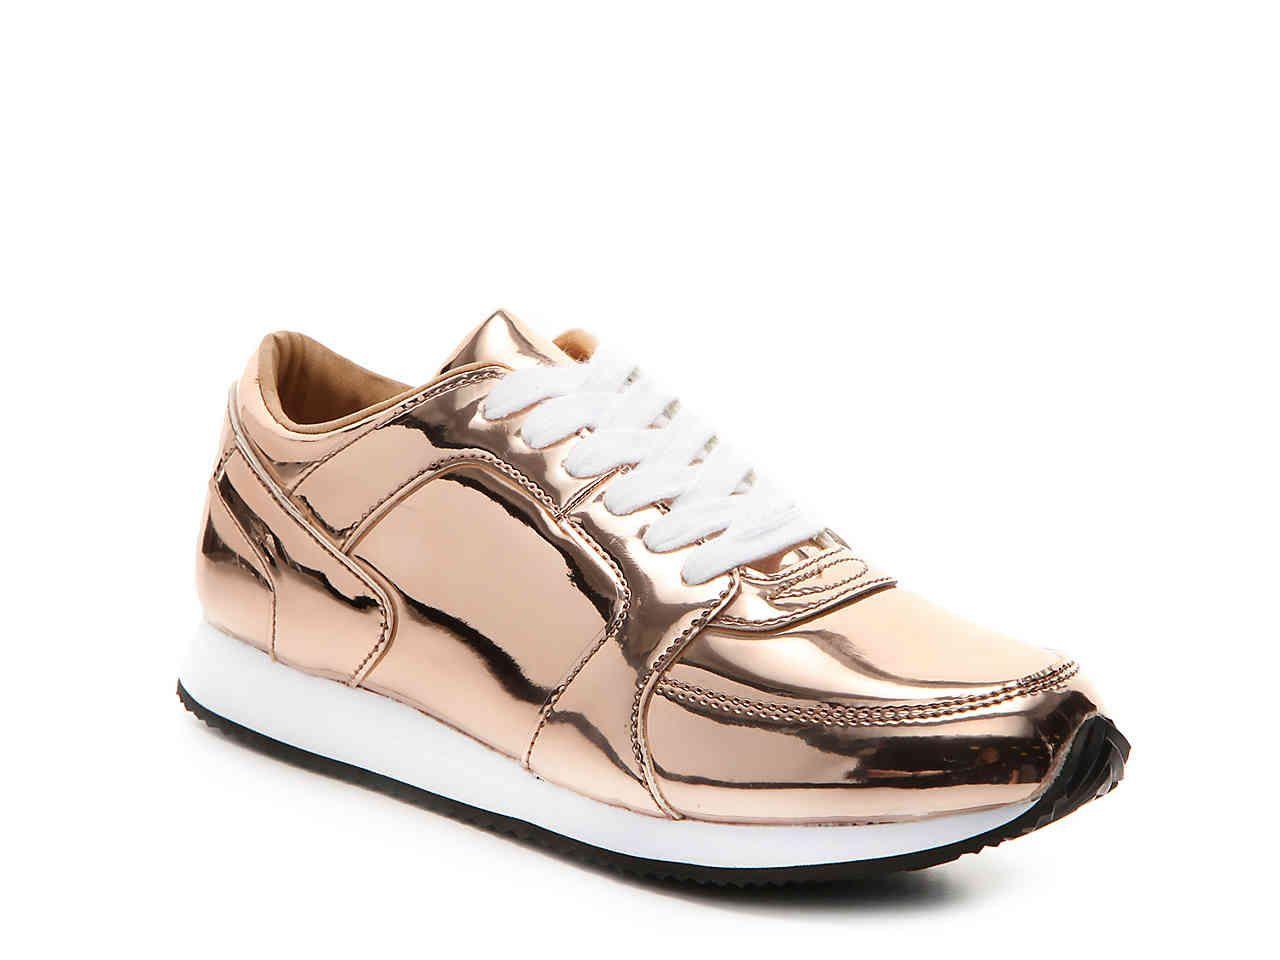 a84c37d7634 PENNY LOVES KENNY Techno Sneaker in Rose Gold Metalic